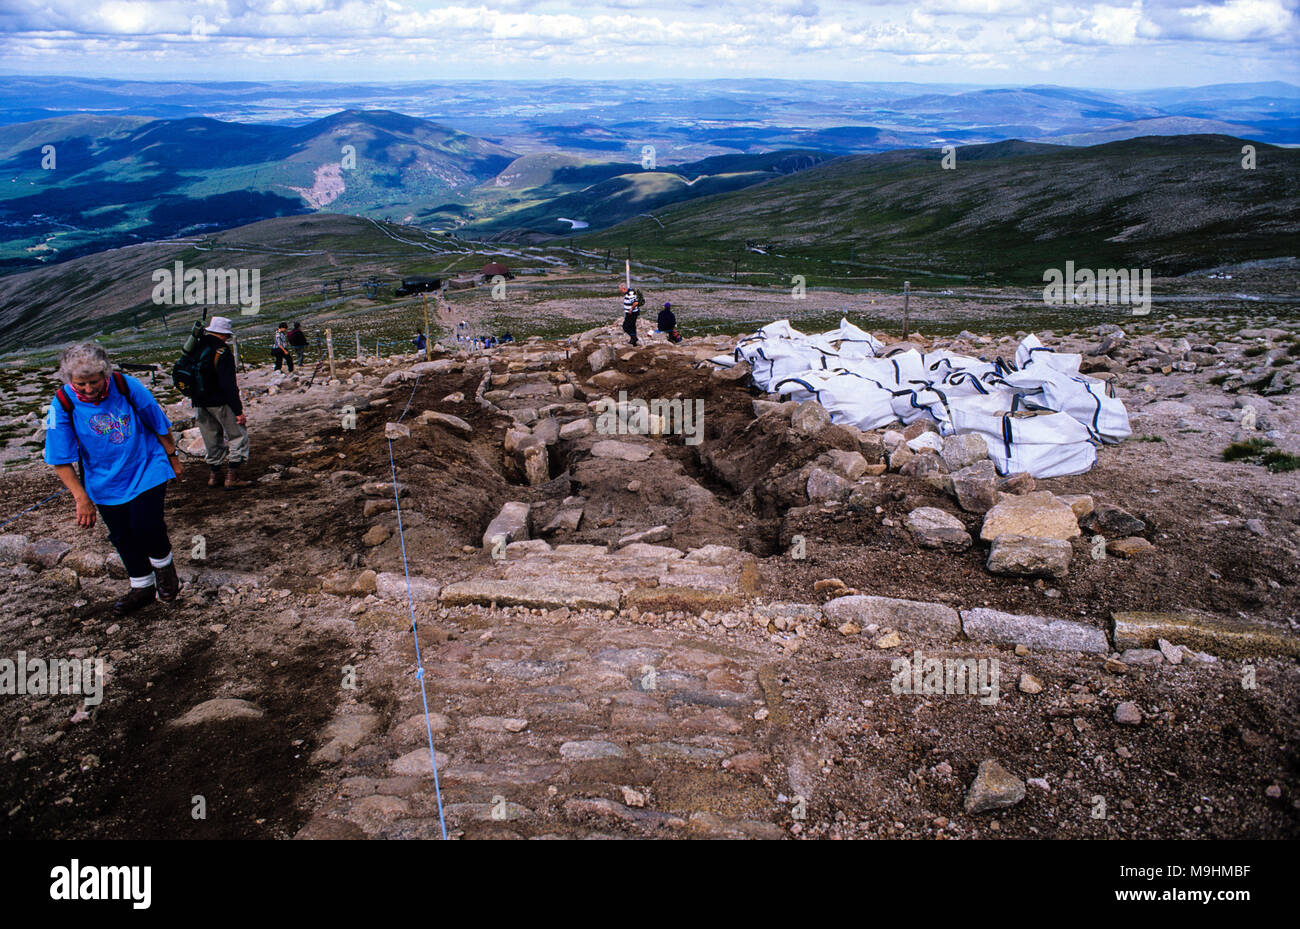 Path Maintenance, Cairngorm Mountain, Cairngorms, Highlands, Scotland, UK. - Stock Image